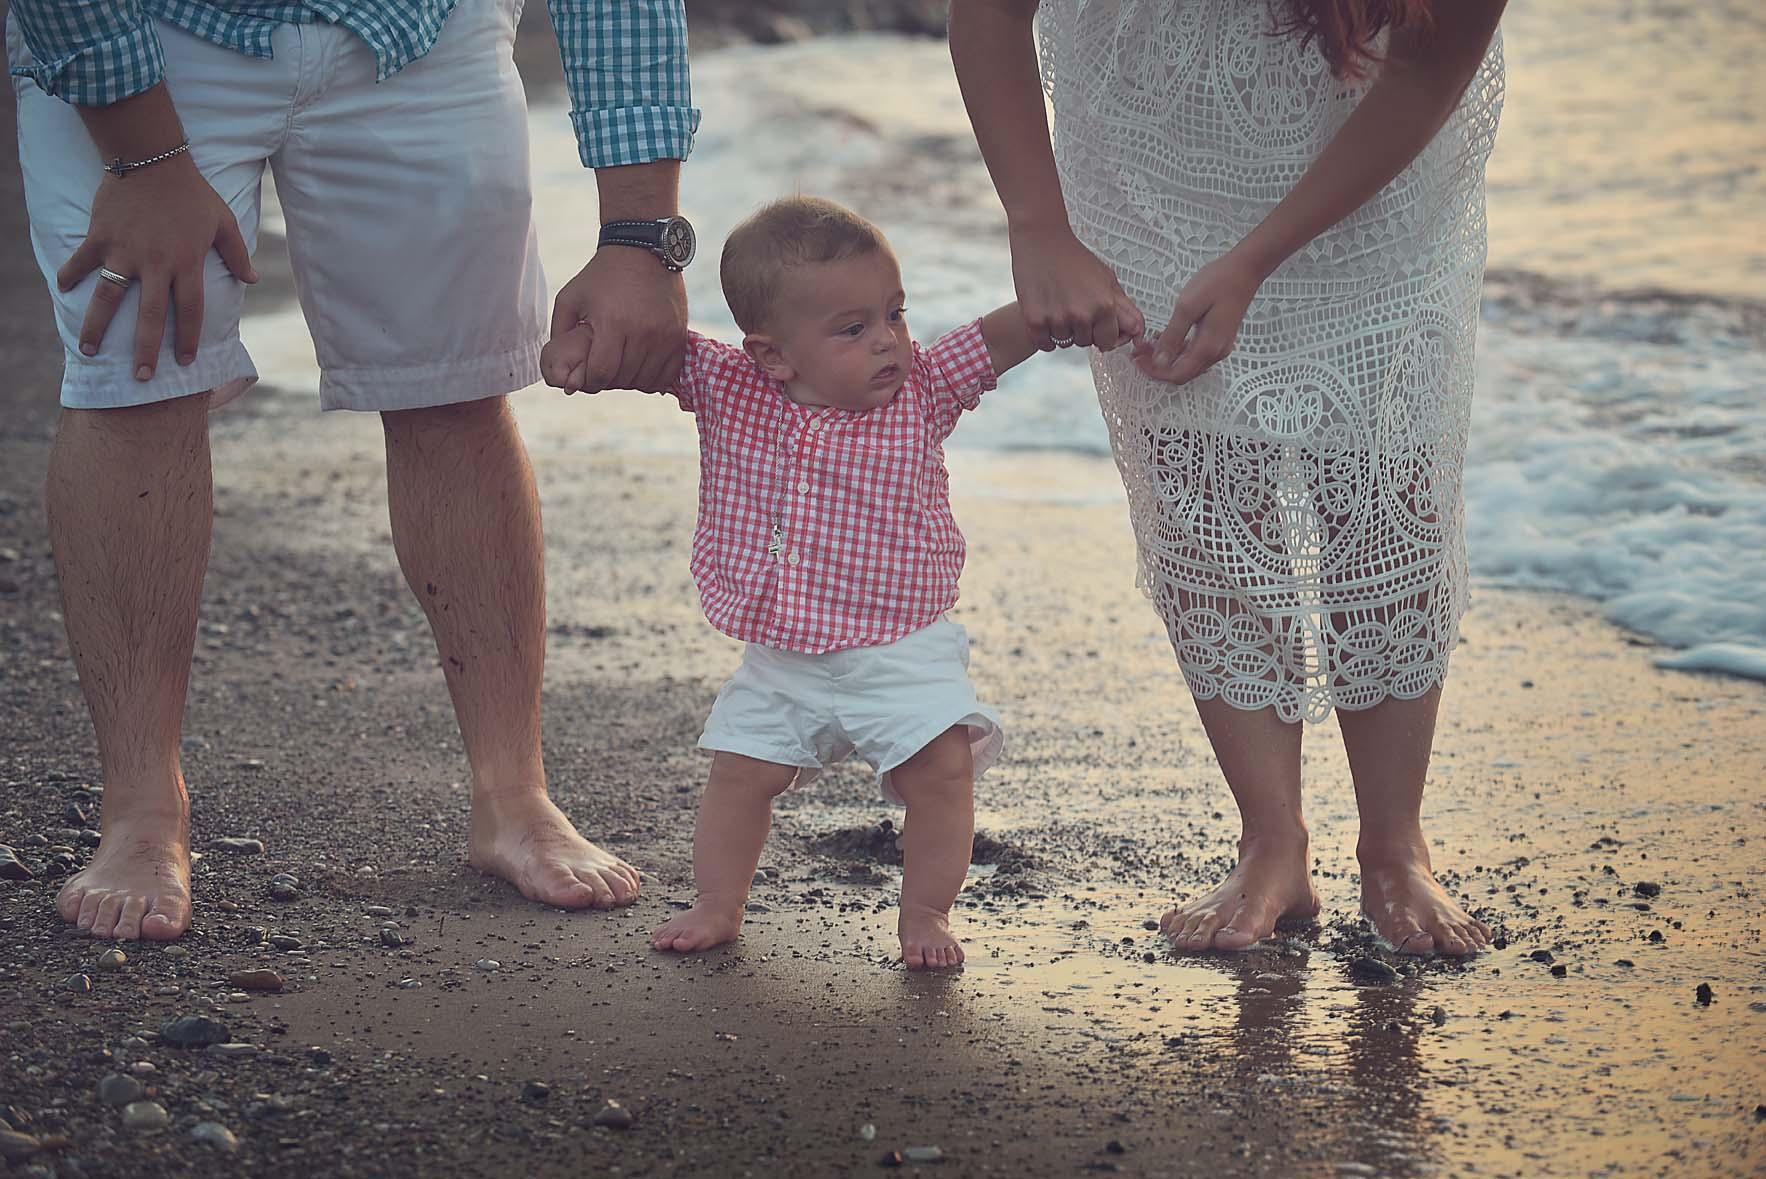 Baptism-chios-island-from-newyork-kambos-christening-sea-05